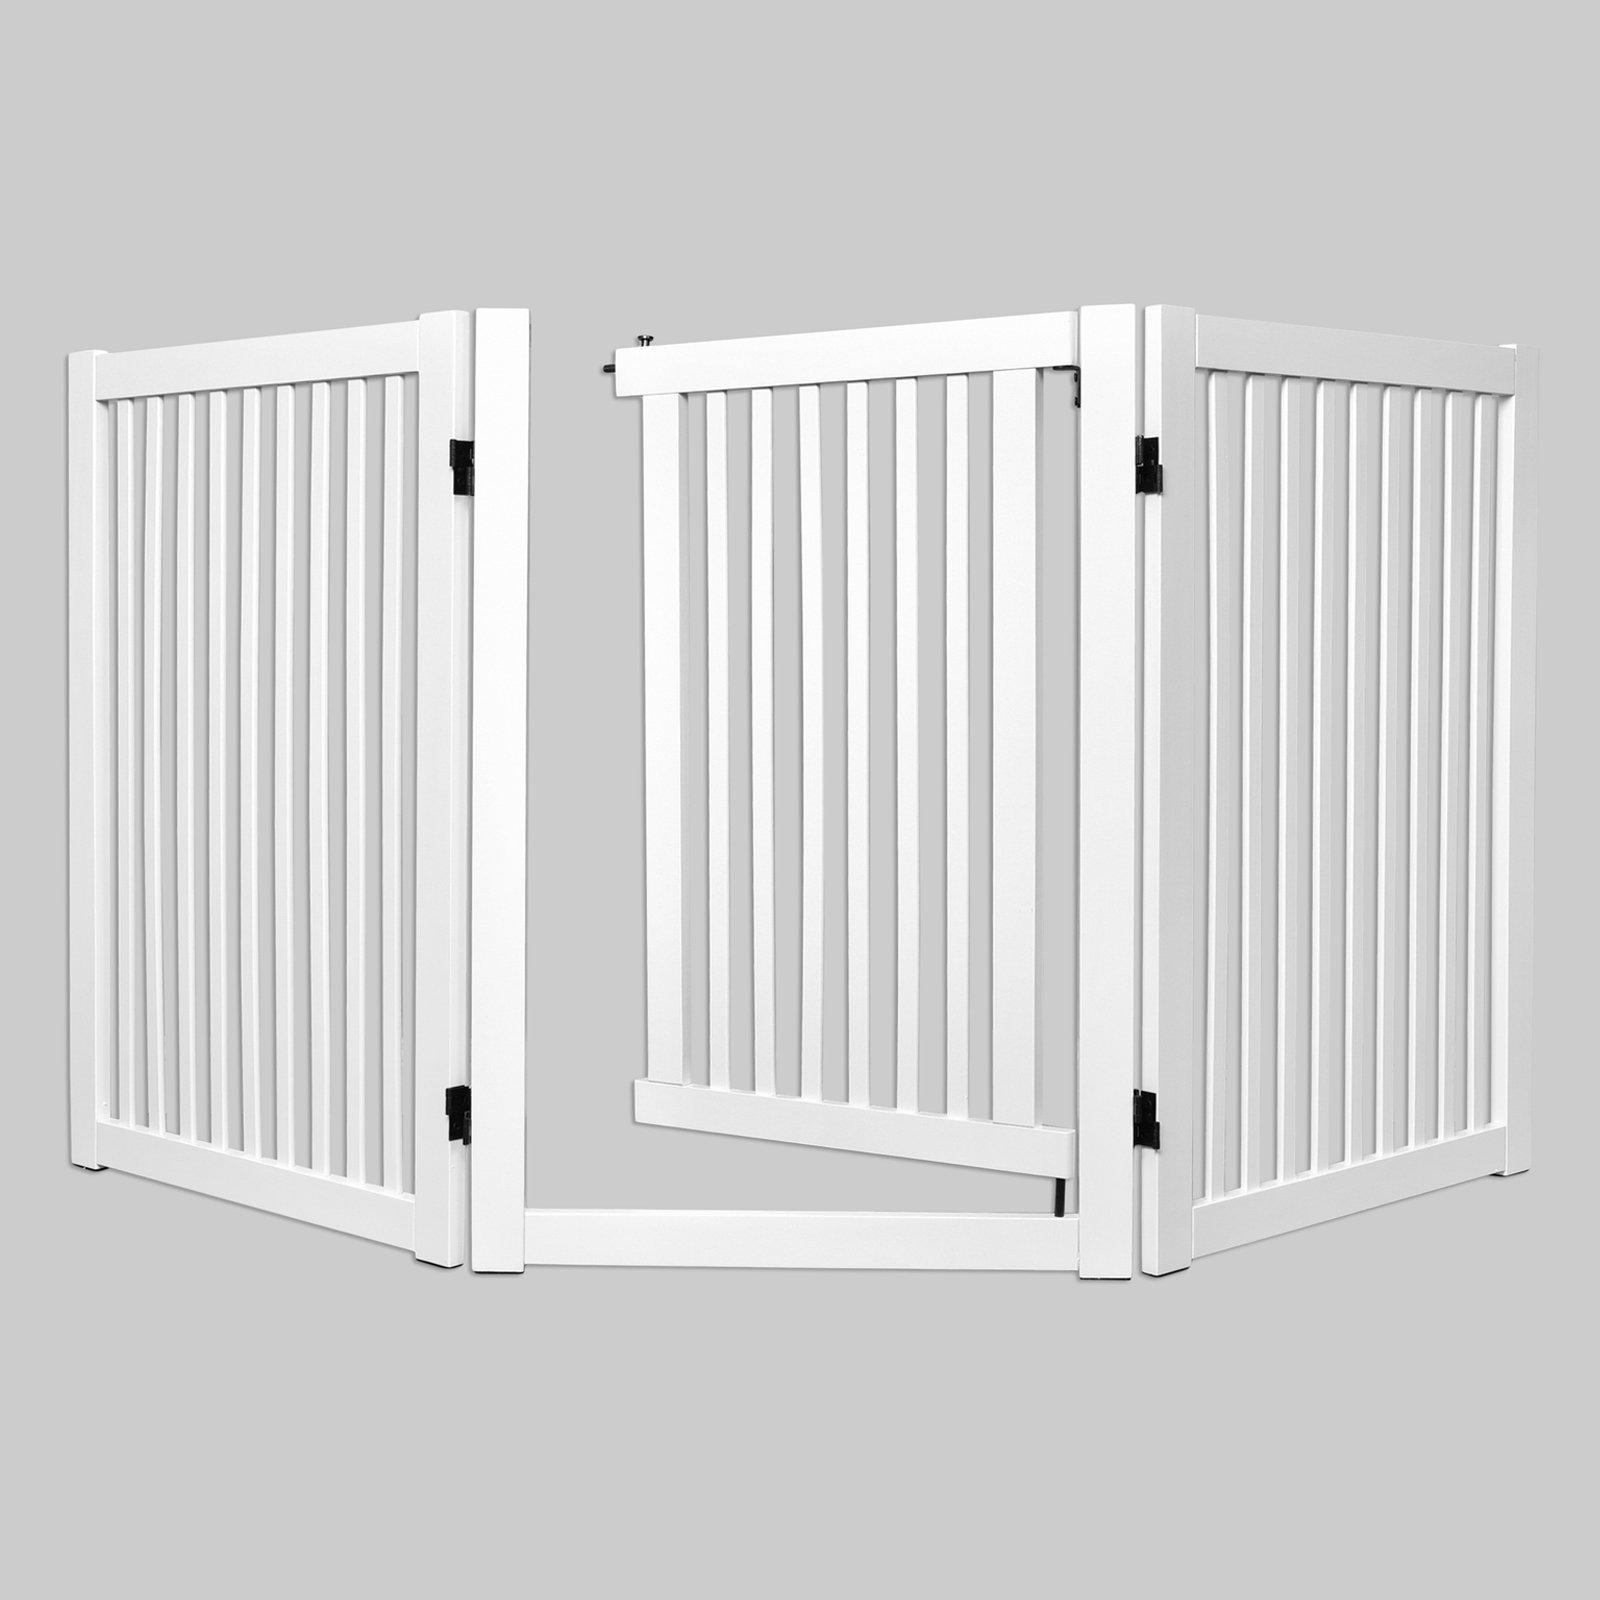 WELLAND Freestanding Wood Pet Gate with Walk Through Door, 66-Inch, White